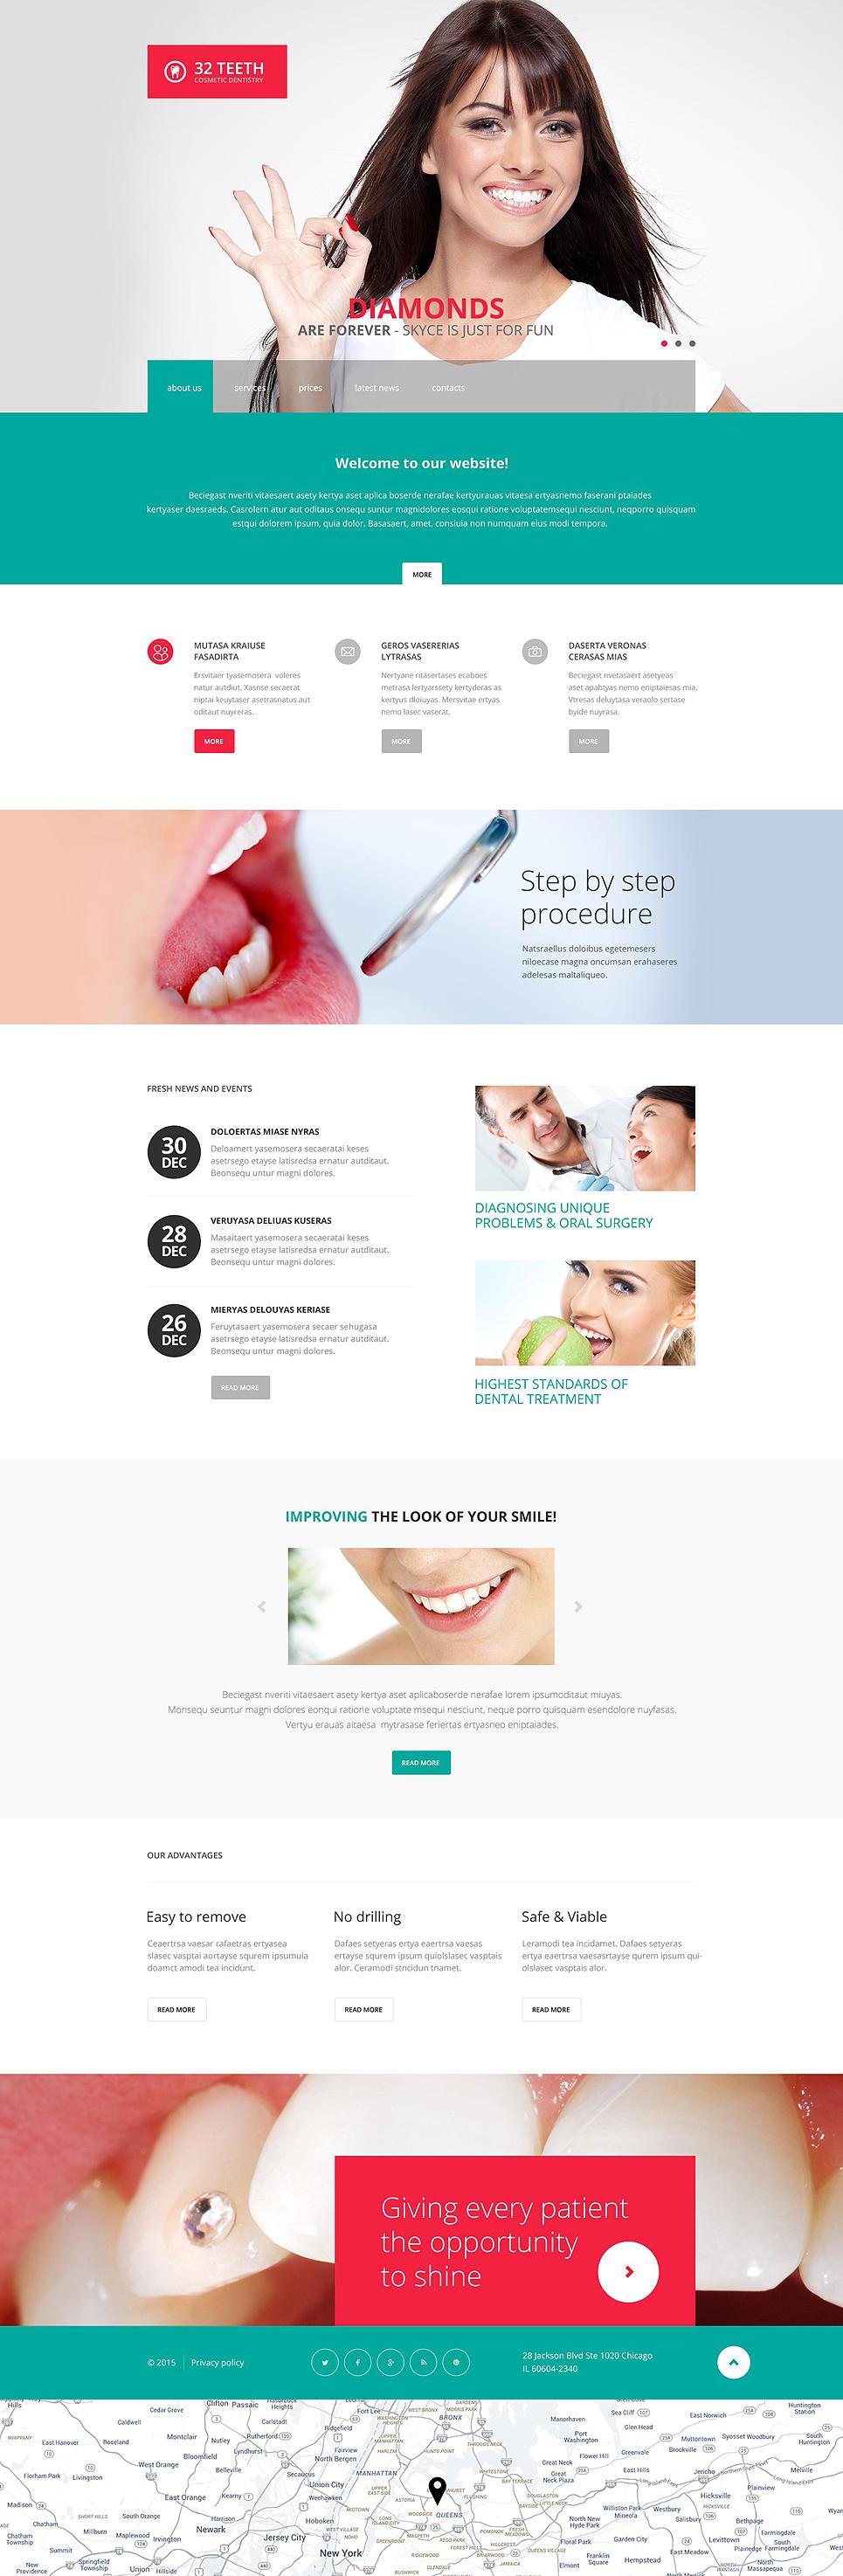 Skyce Dentistry template illustration image